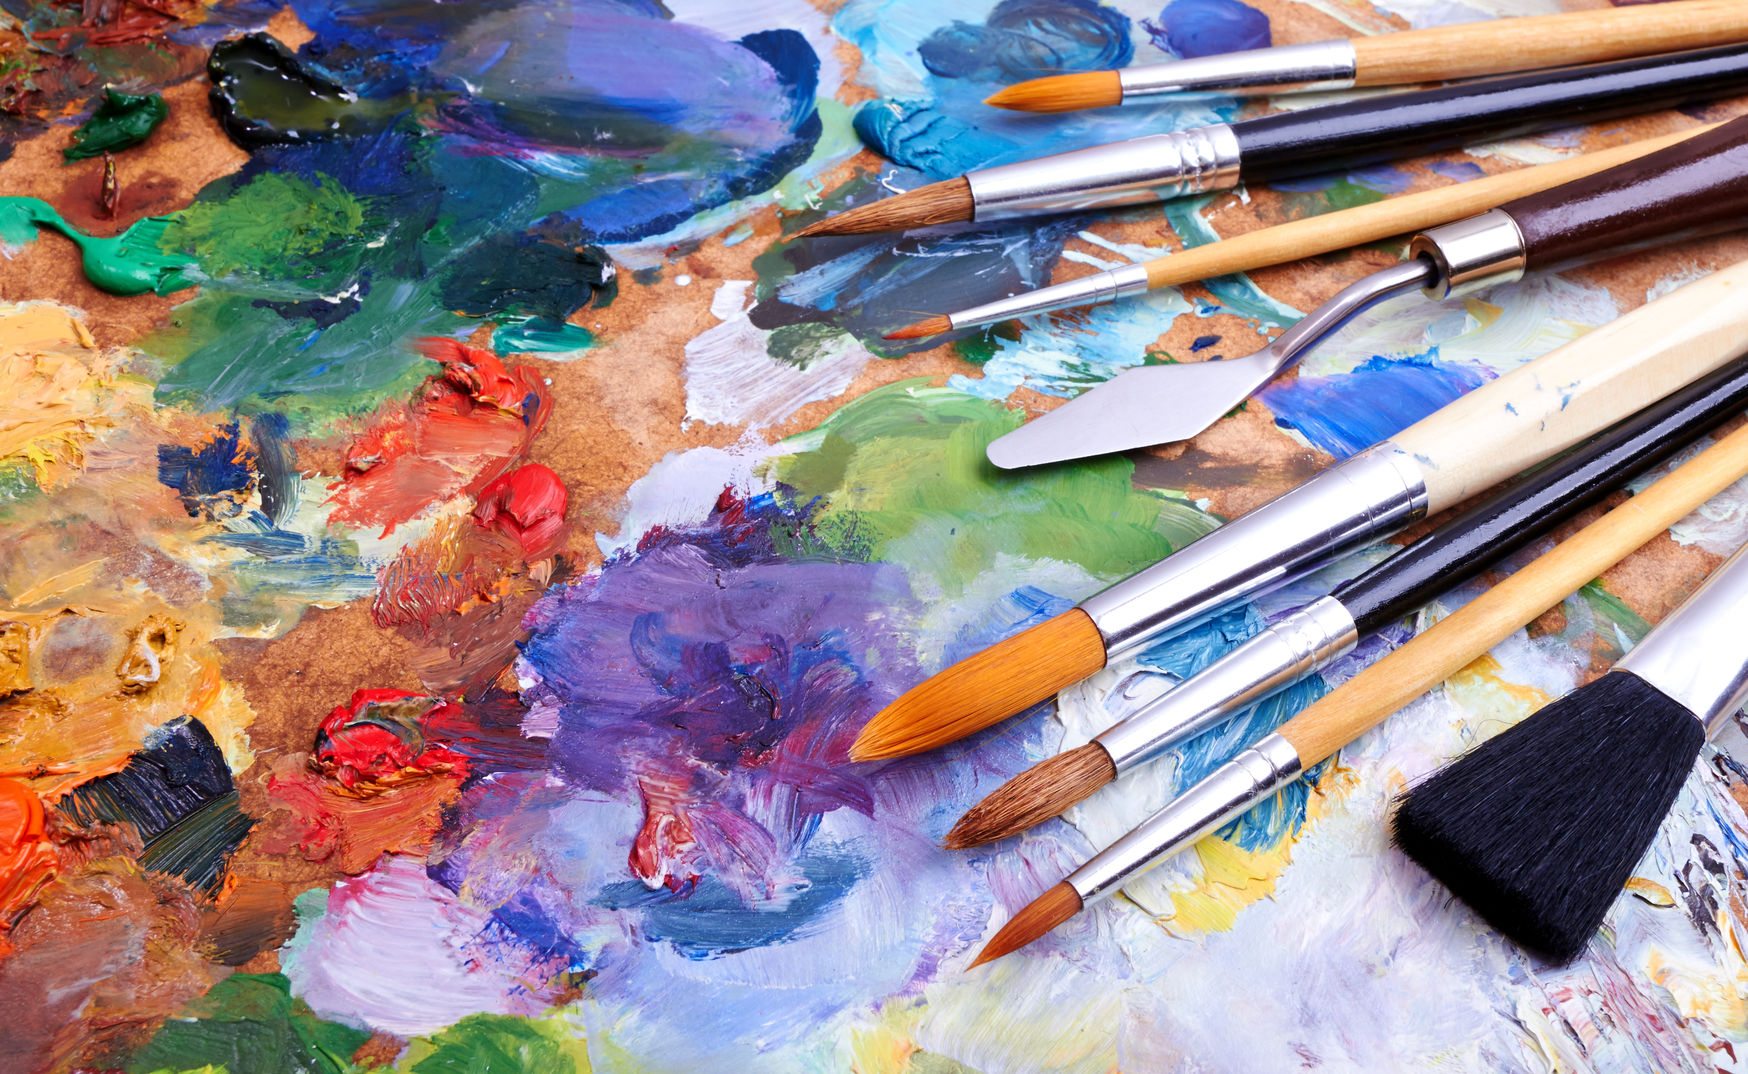 arte-e-negocios-carlos-damasceno-desenhos-realistas